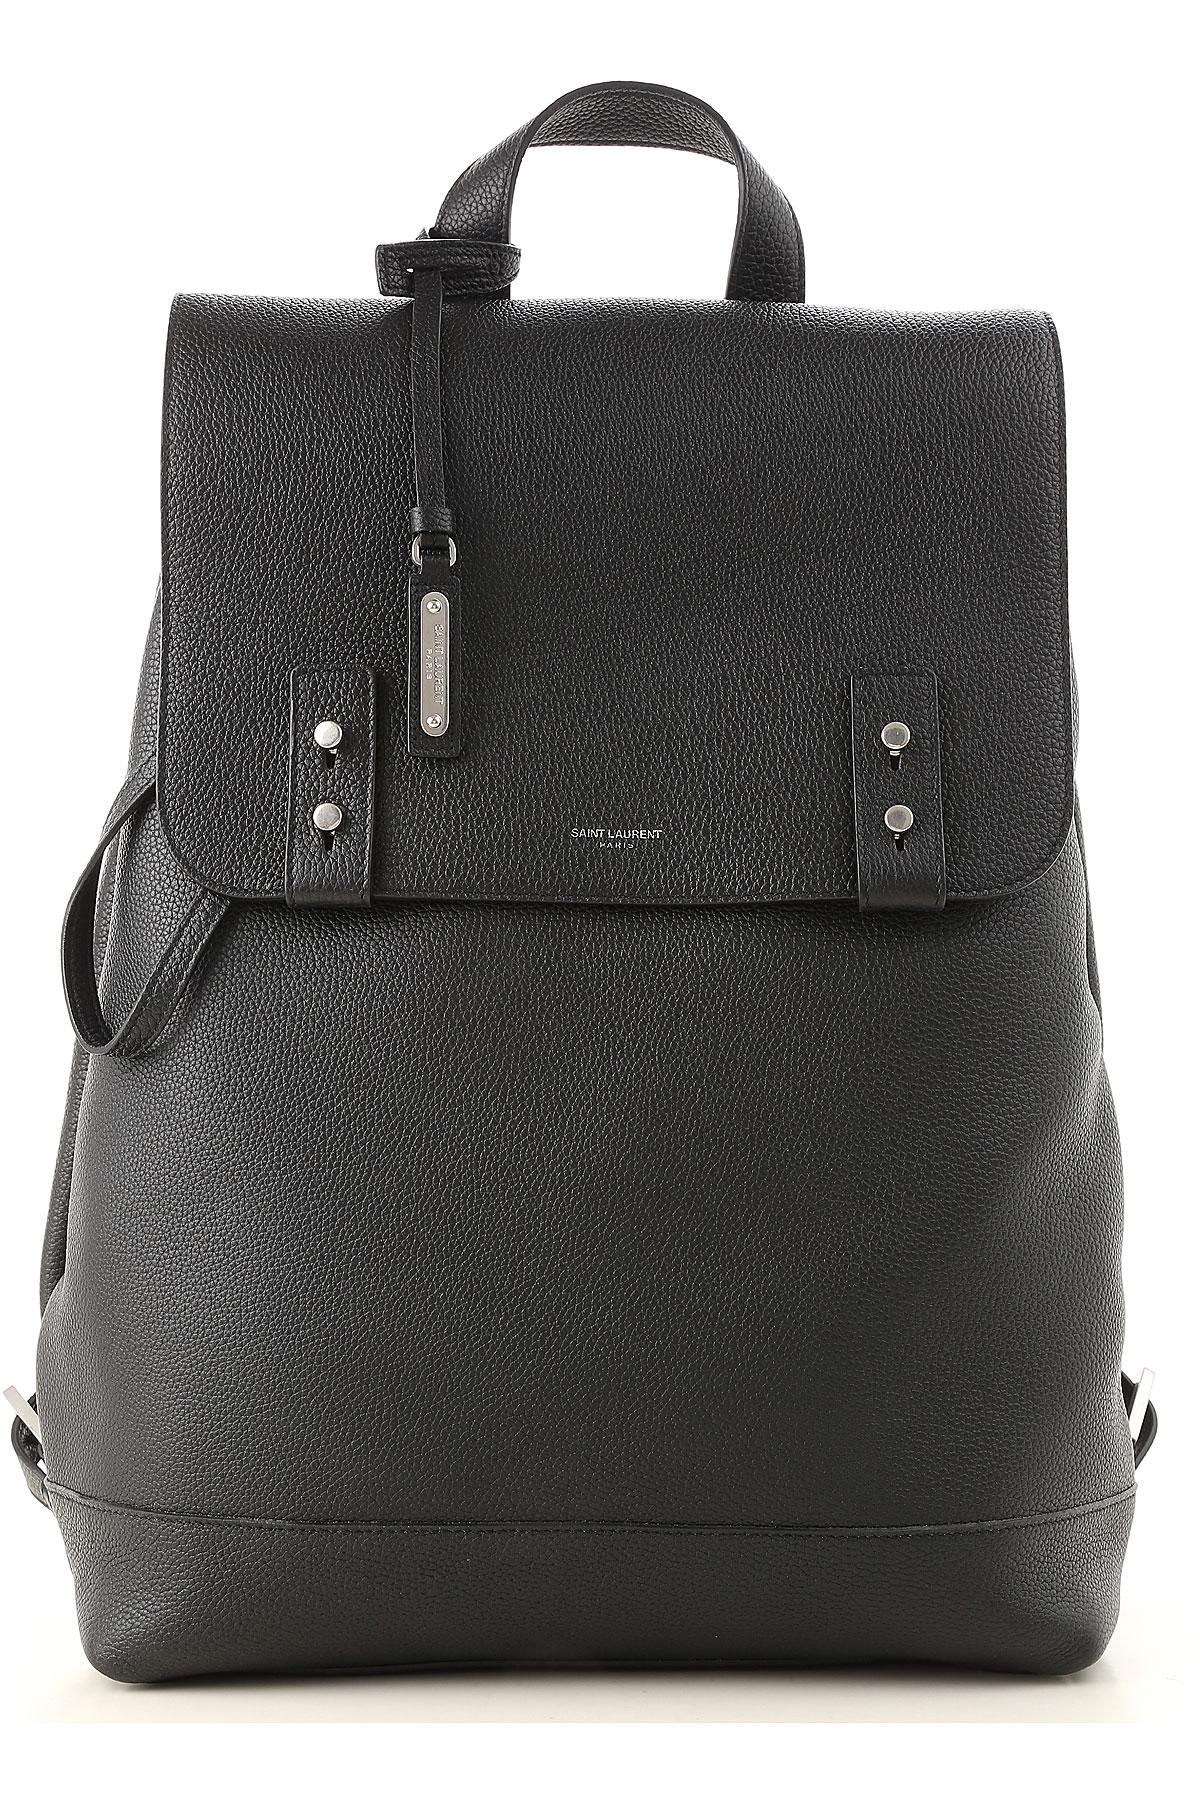 Image of Yves Saint Laurent Backpack for Men, Black, Leather, 2017